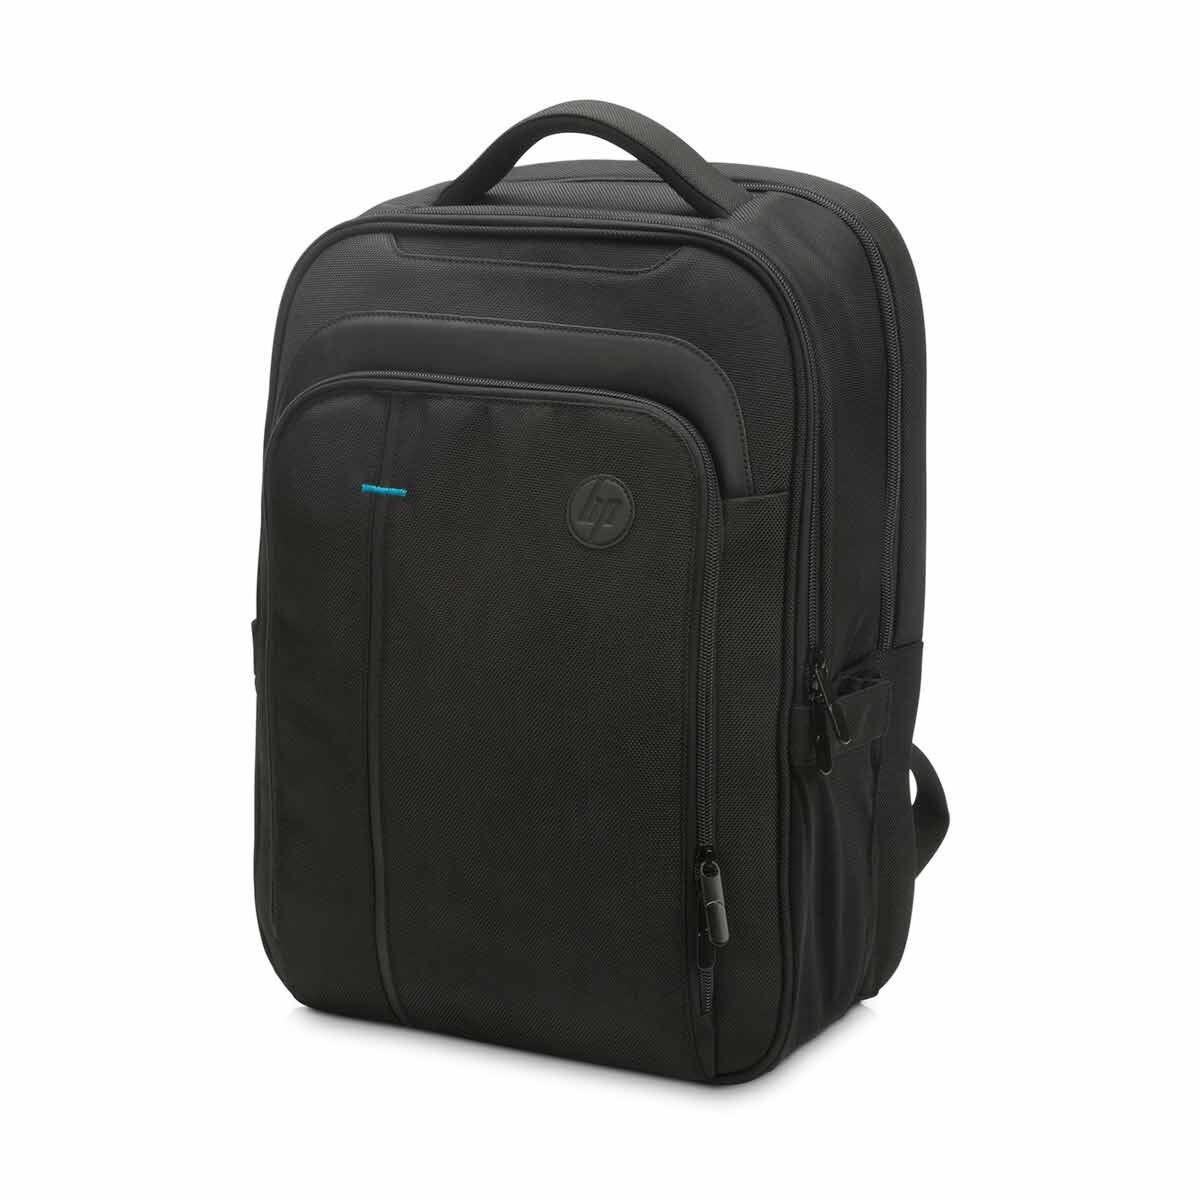 HP Legend Topload Laptop Backpack 15.6 Inch